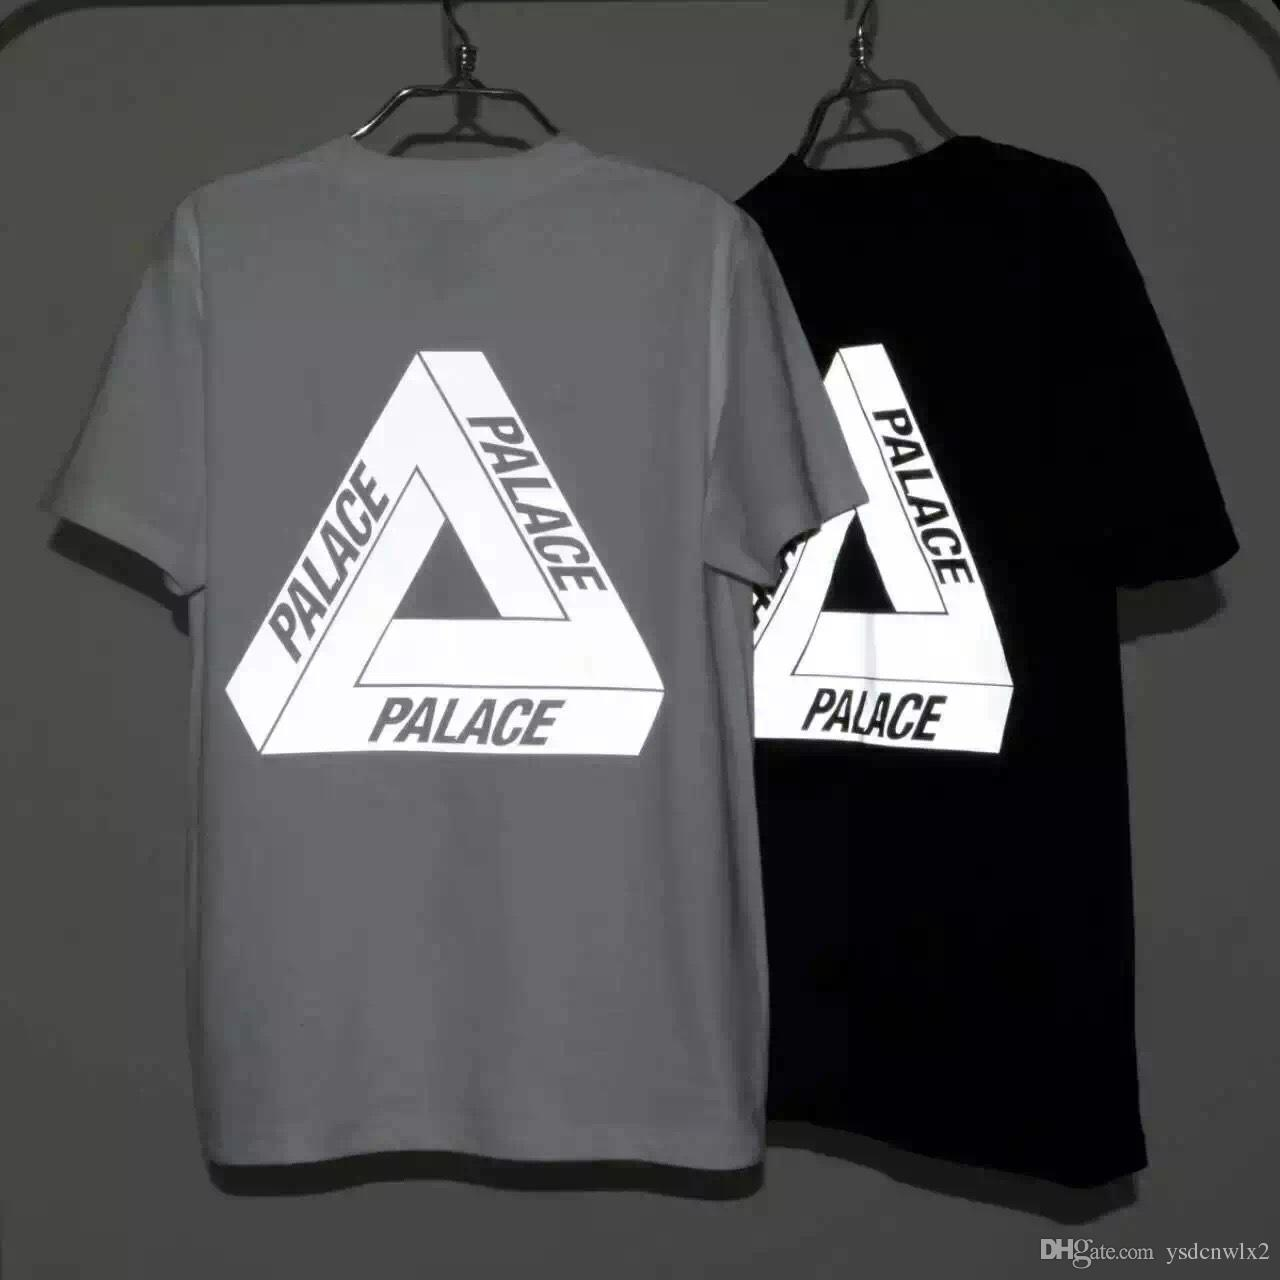 2016 Fashion Black/White Palace T Shirt Men Women Rock Clothing ...